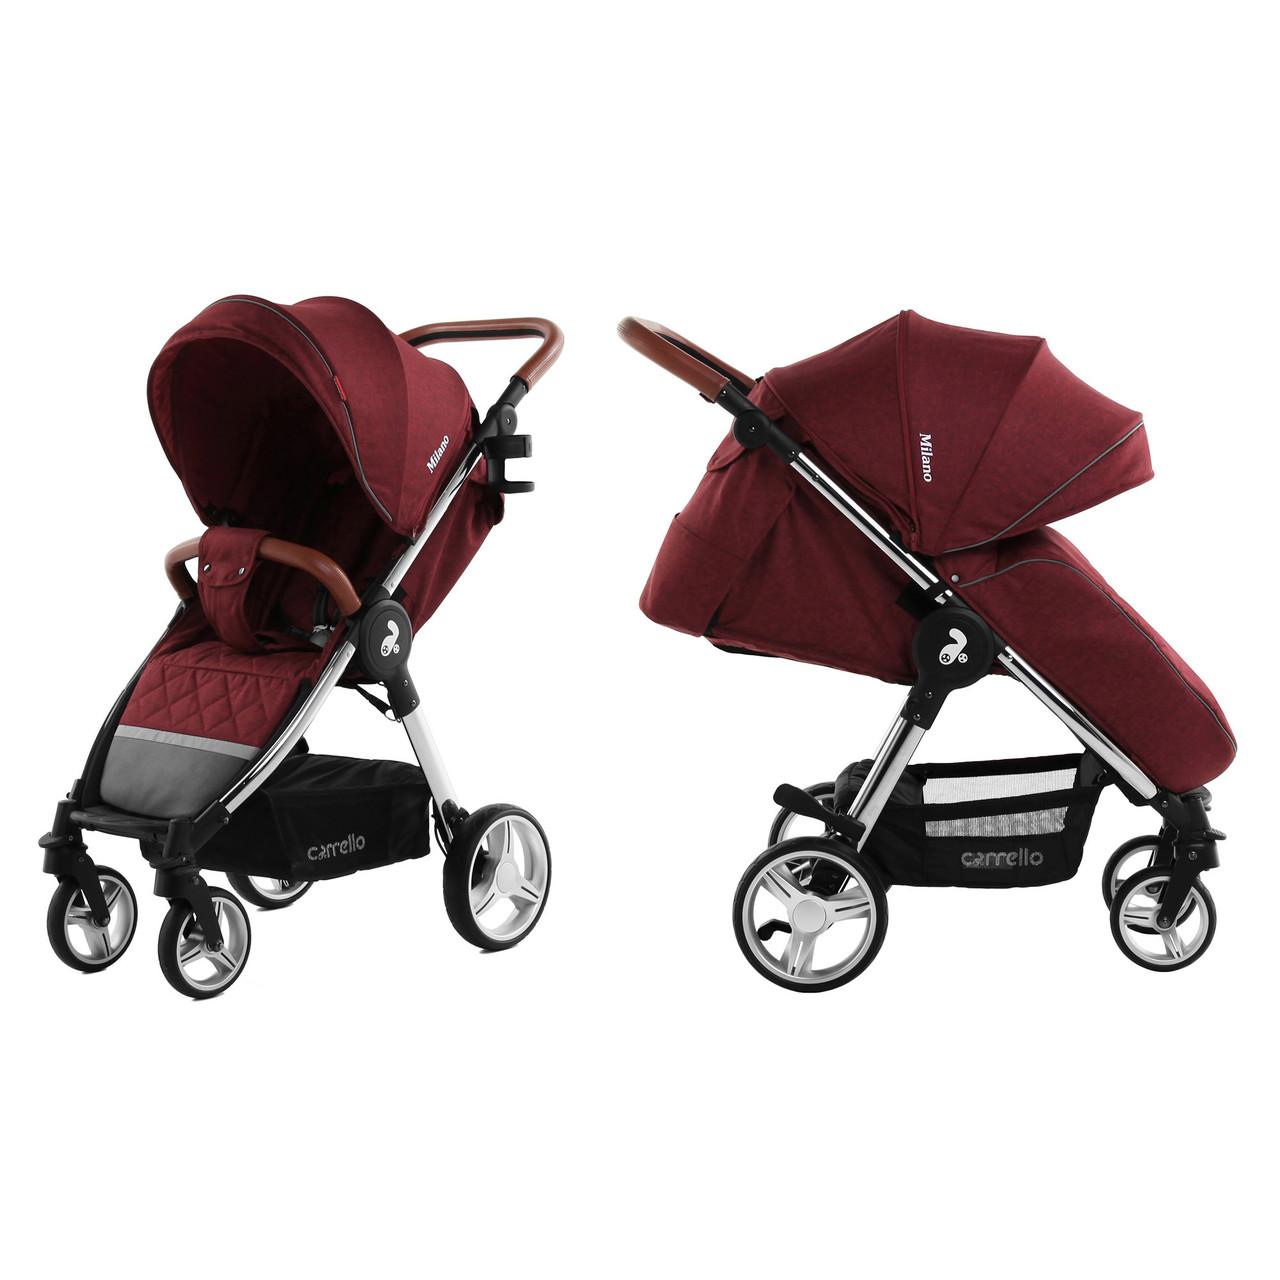 Коляска прогулочная CARRELLO Milano CRL-5501 Tango Red Ухти-Тухти Кривой Рог